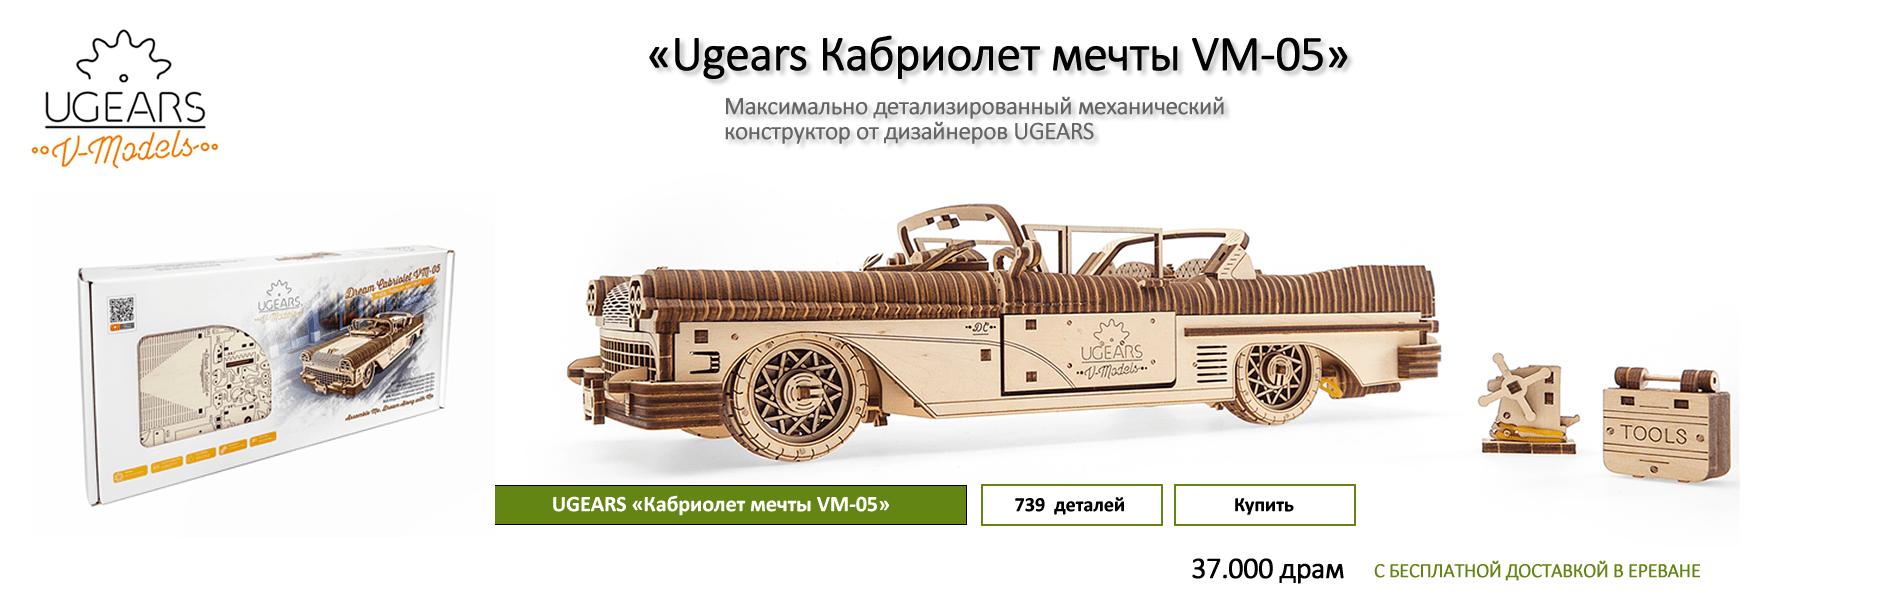 «Кабриолет мечты VM-05»